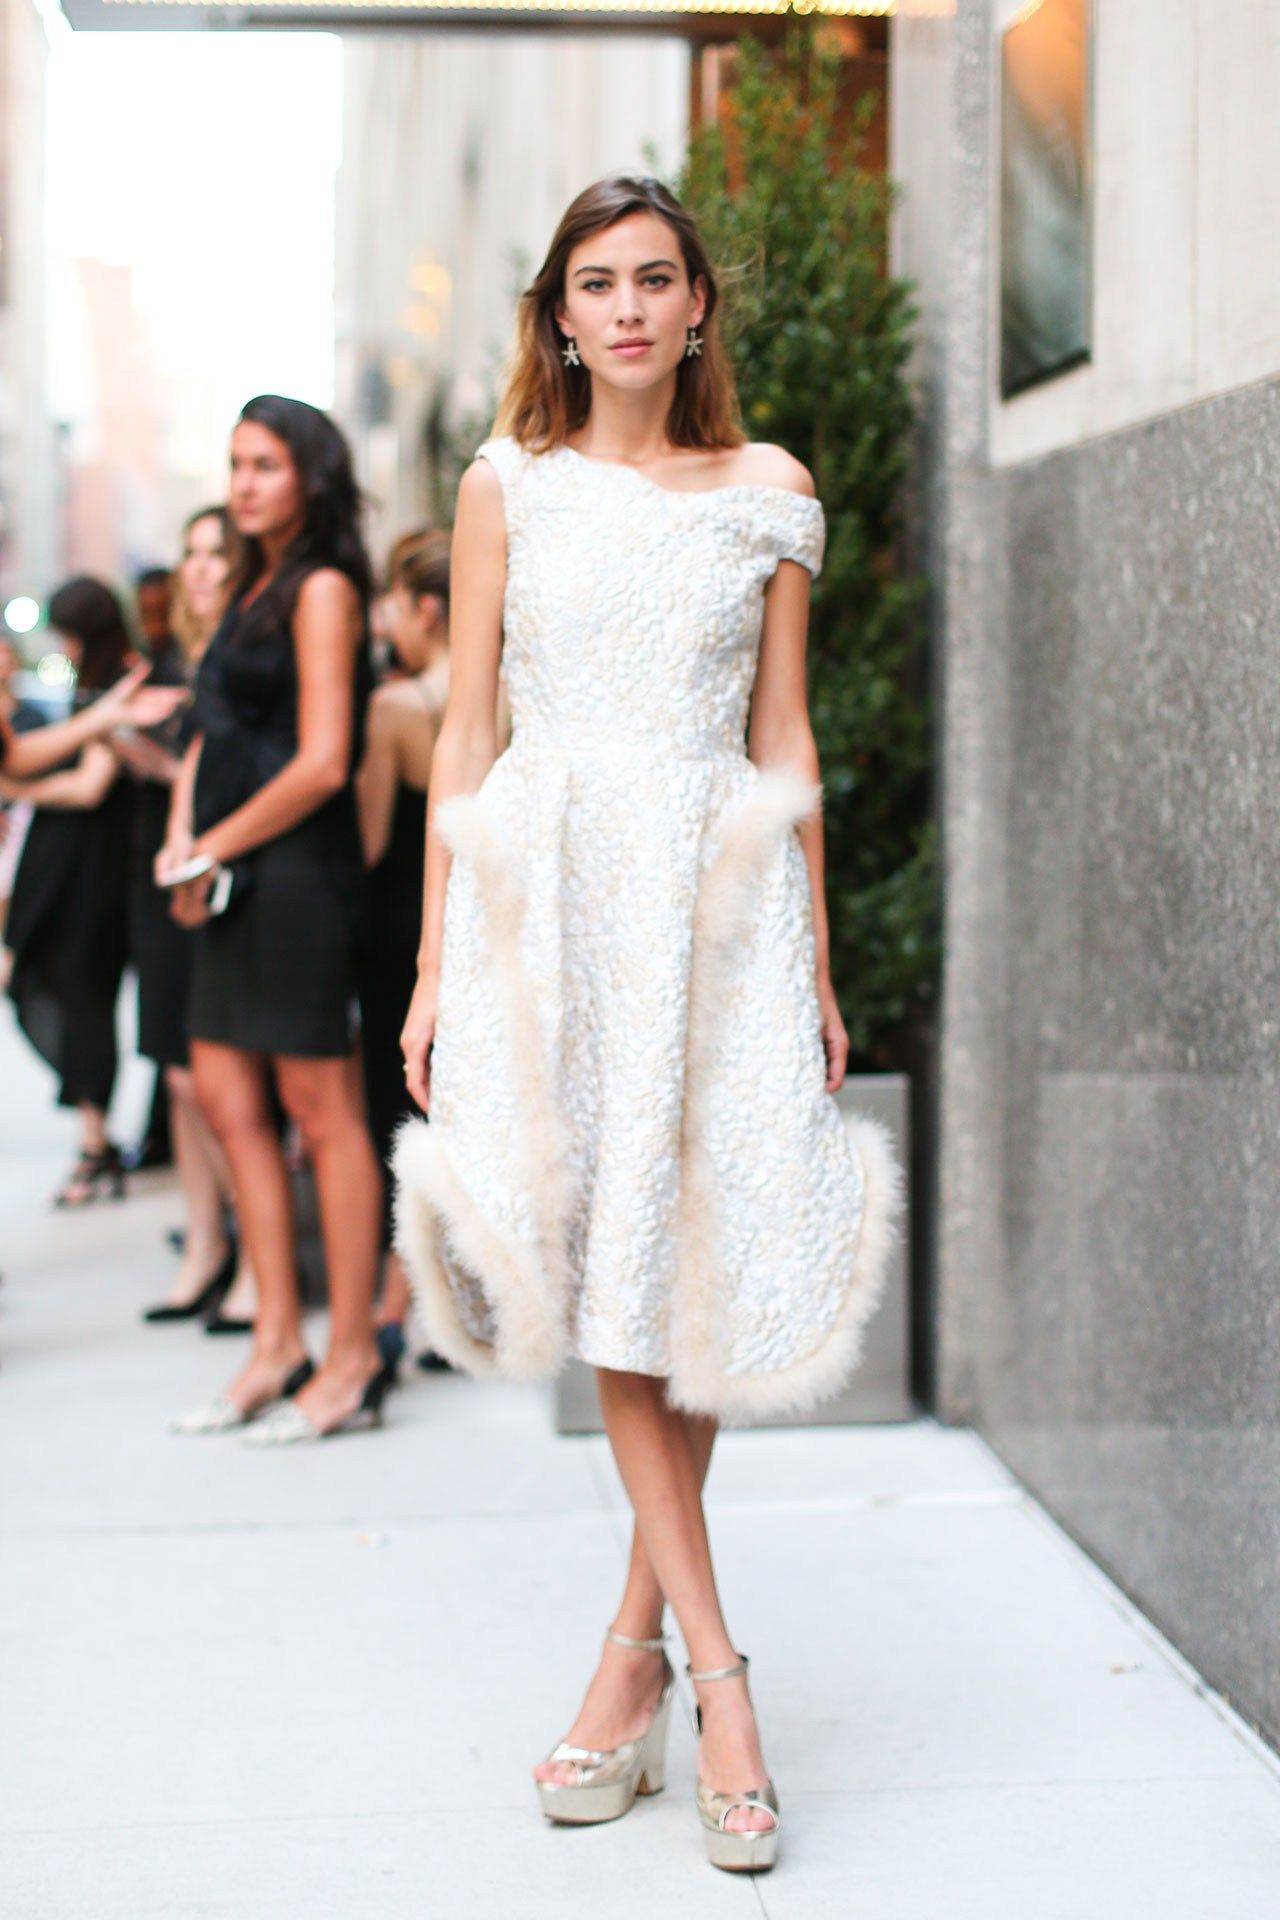 Alexa Chung. | Fashion | Pinterest | Moda la, Duendes y Alta costura